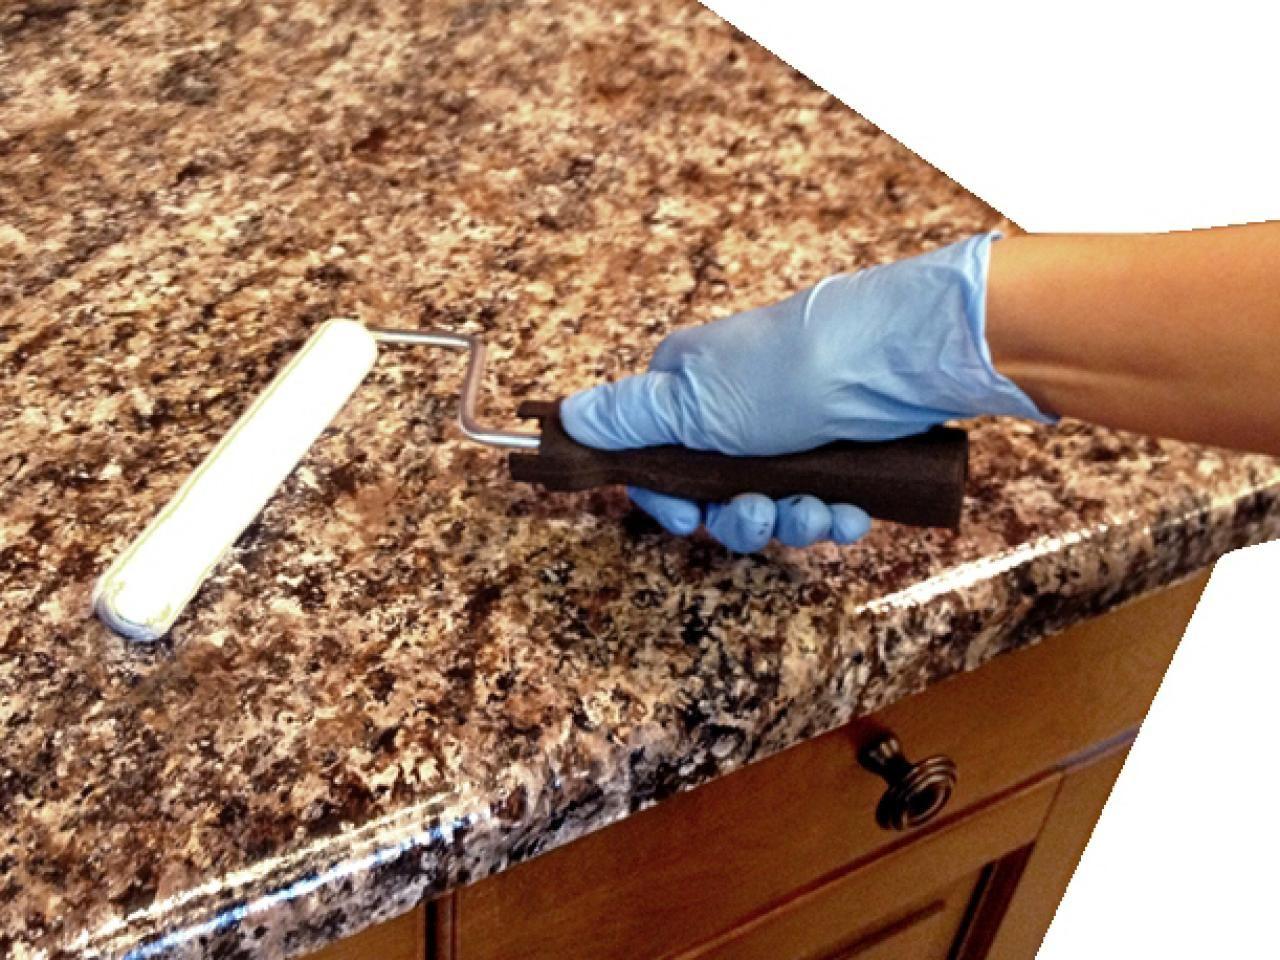 how to paint laminate kitchen countertops | laminate kitchen